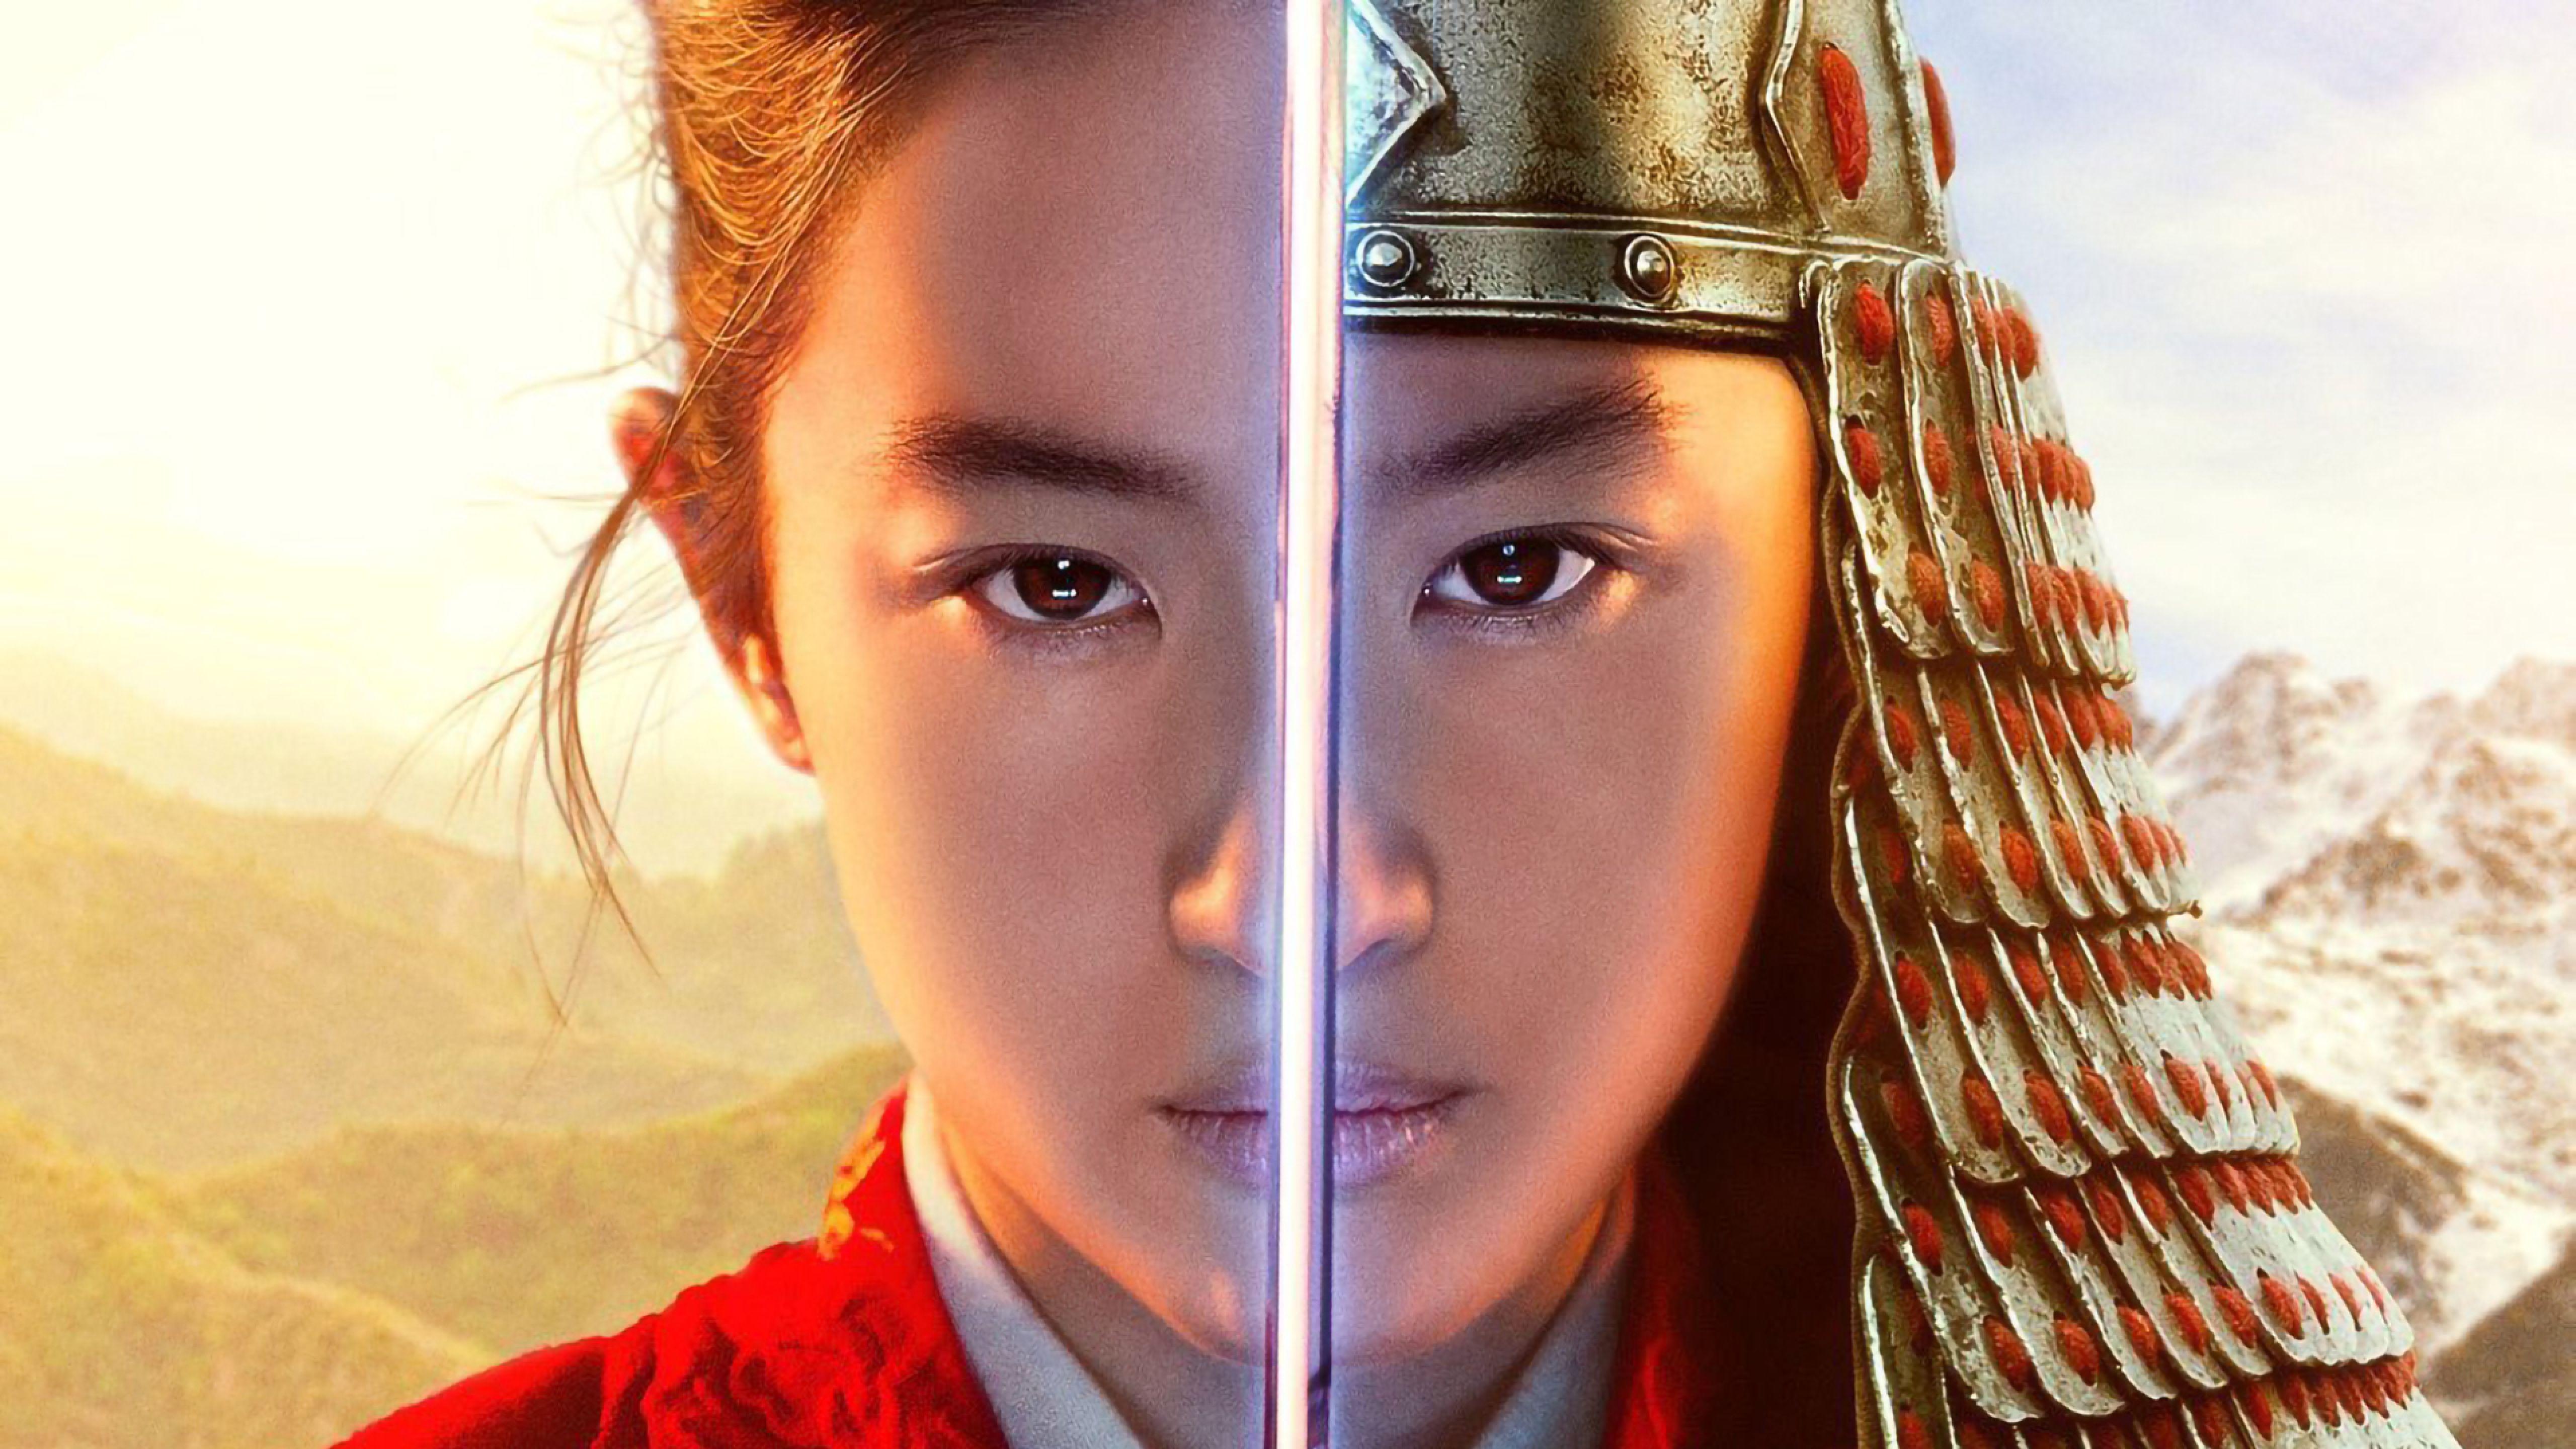 Mulan As Warrior Poster Wallpapers Wallpaper Cave